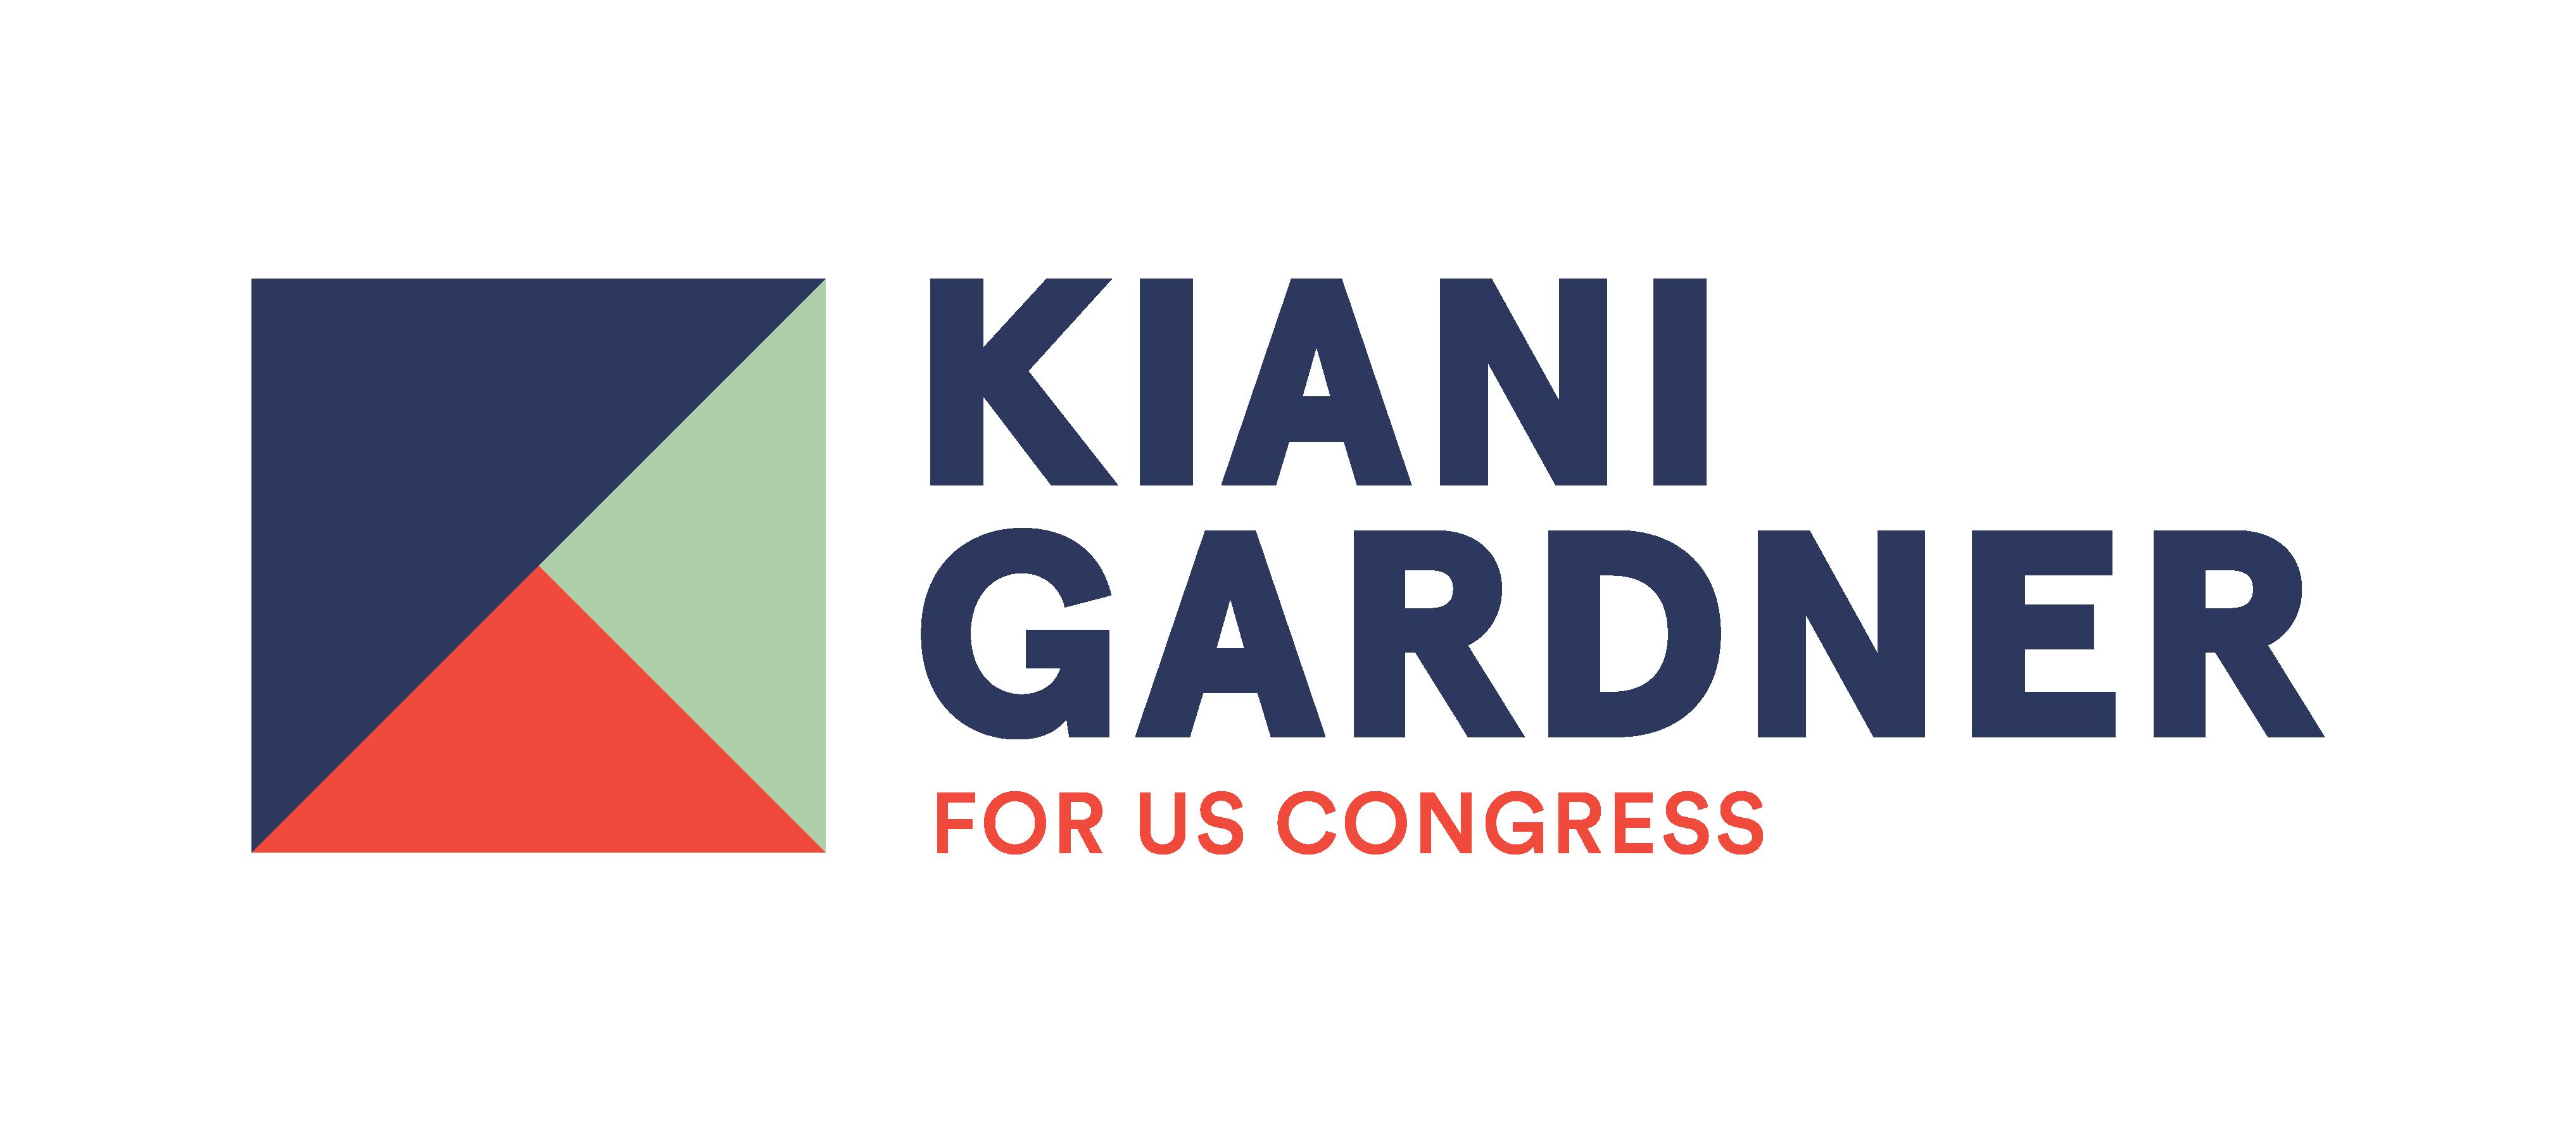 Kiani Gardner